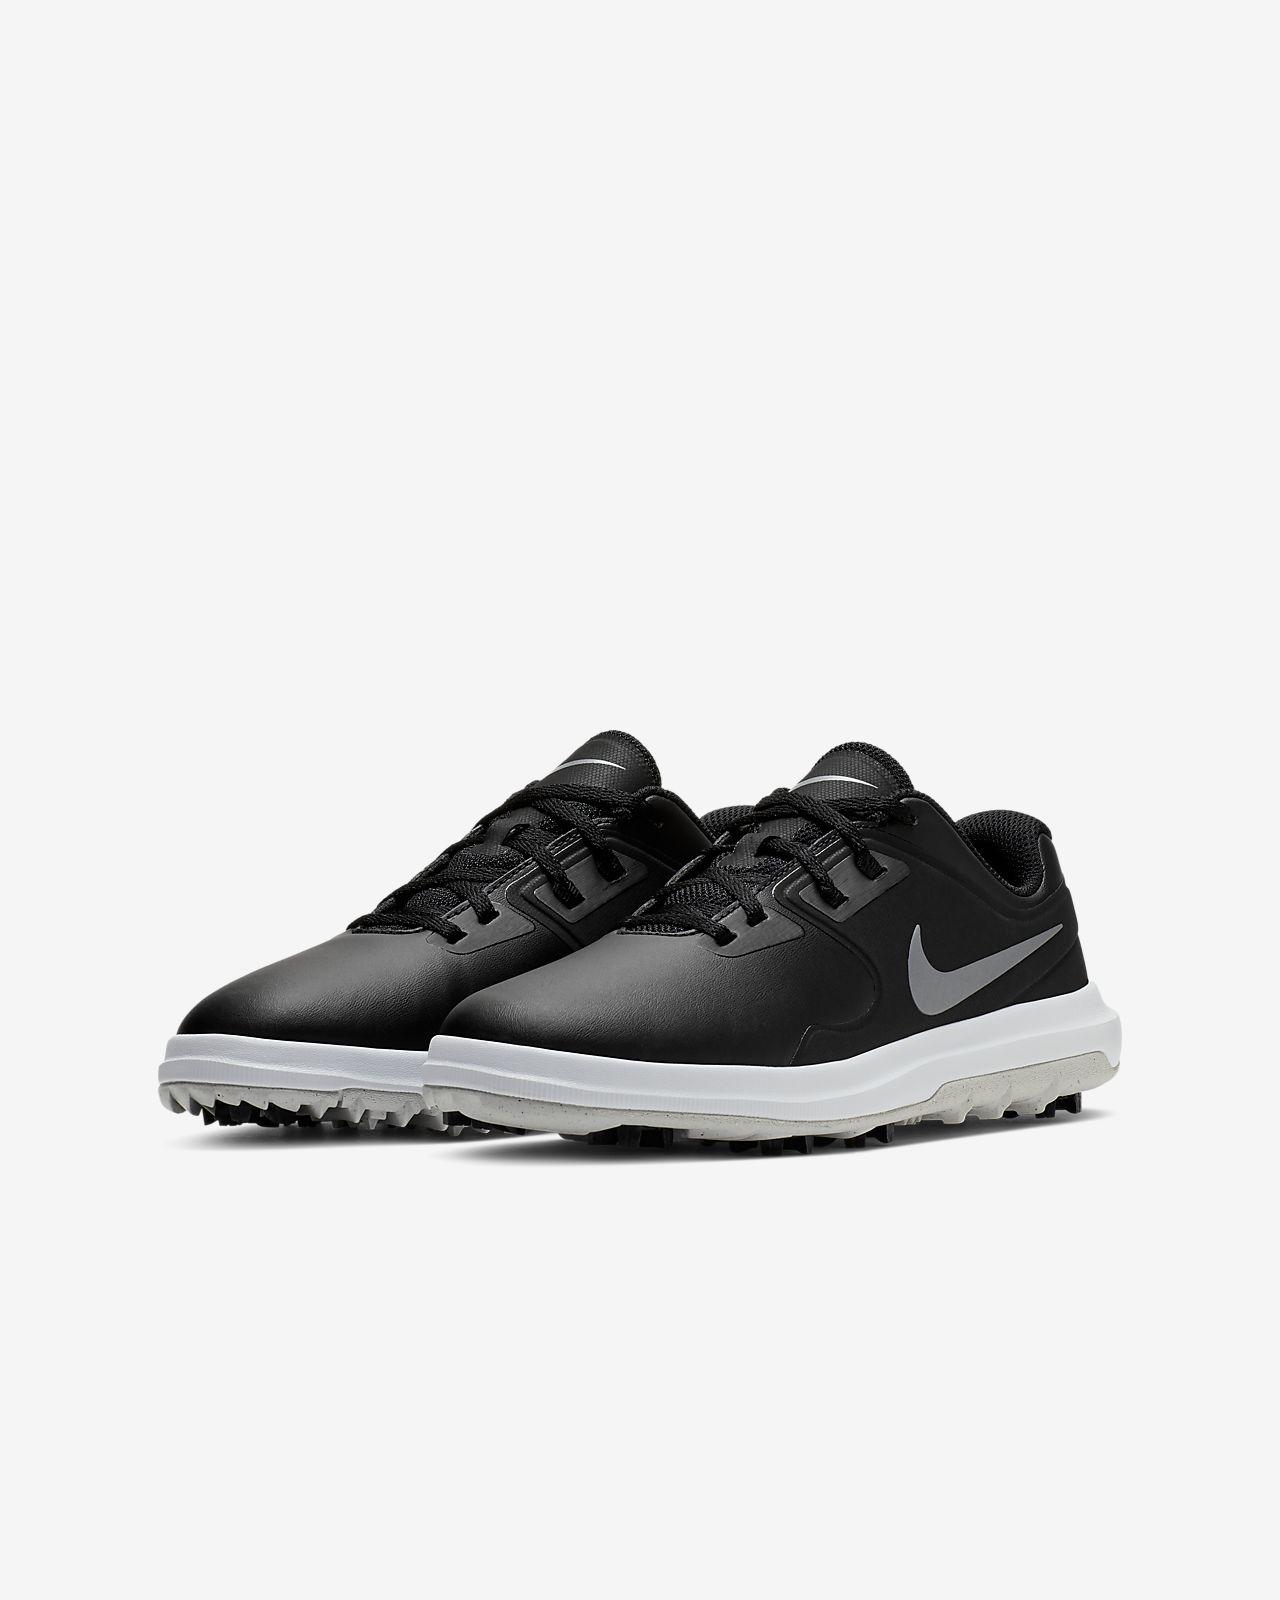 837e553b0ad Nike Vapor Pro Jr. Younger Older Kids  Golf Shoe. Nike.com IE